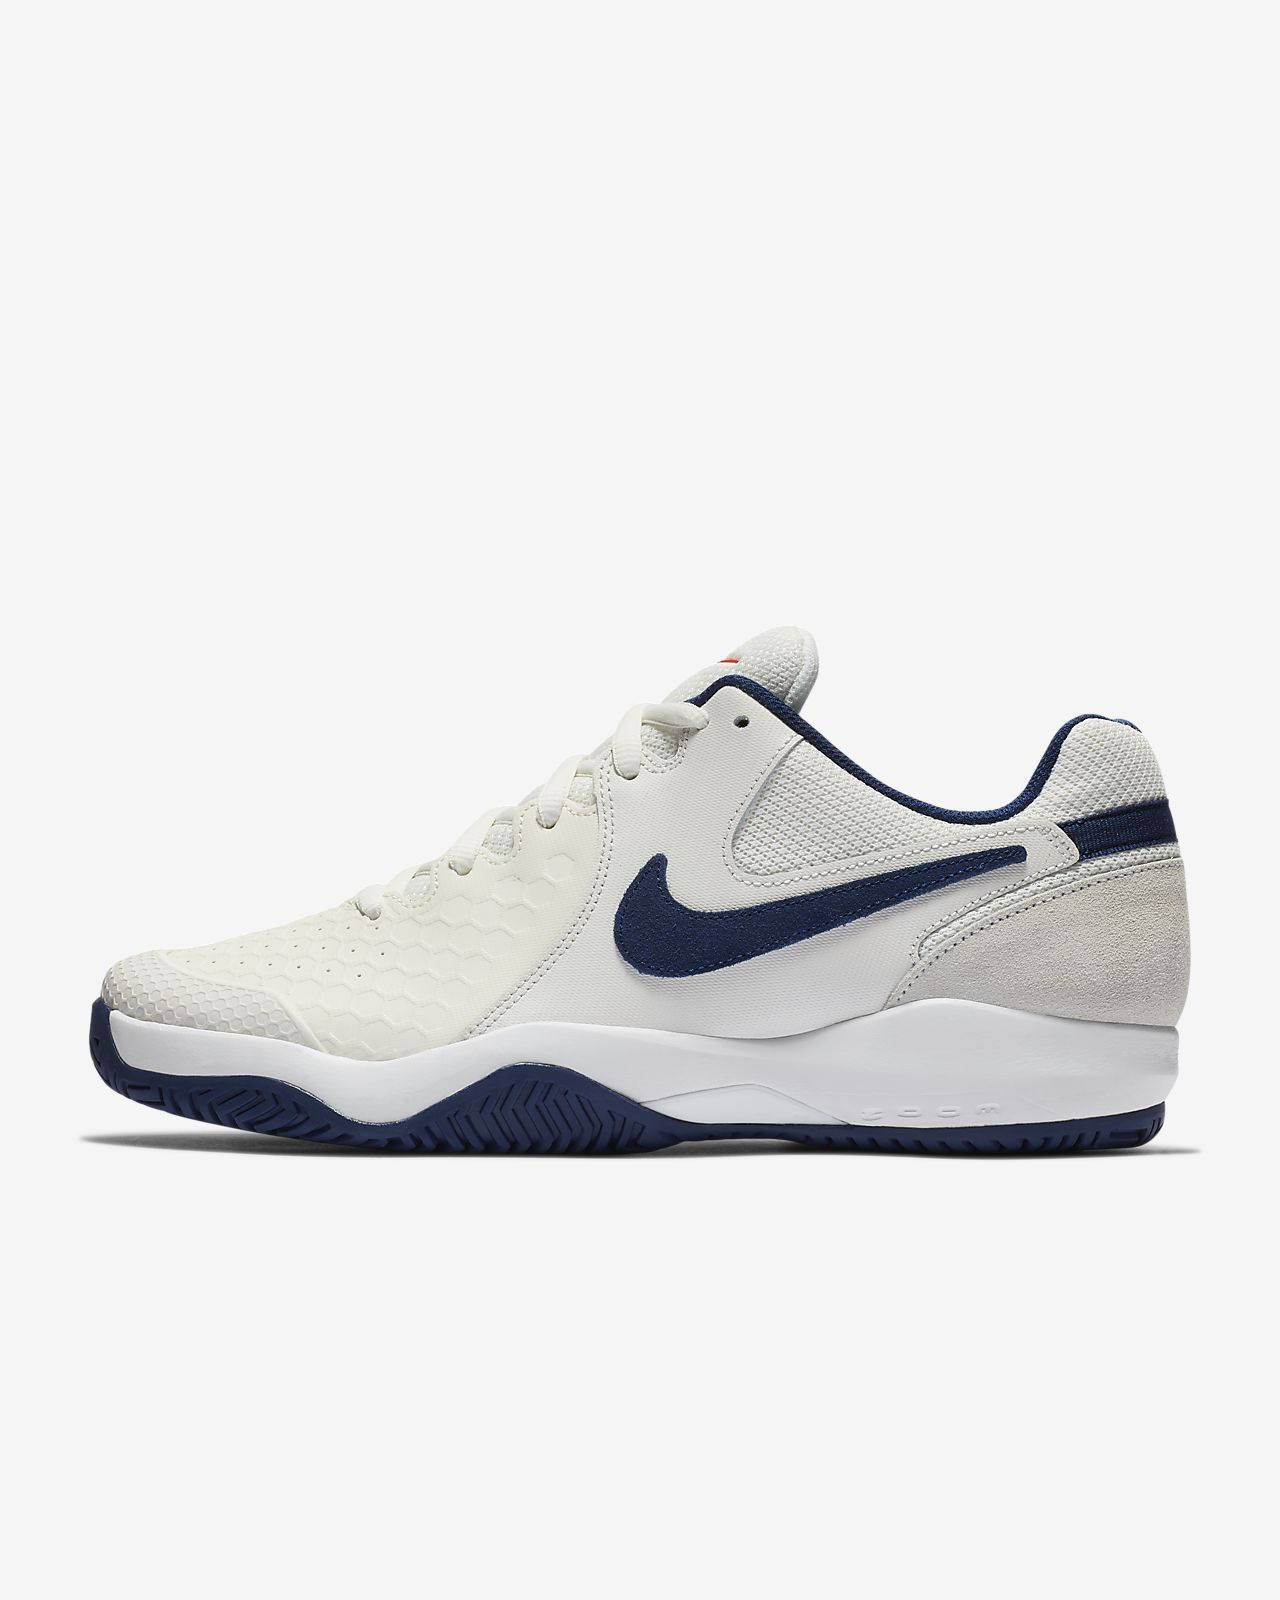 Calzado de tenis en cancha dura para hombre NikeCourt Air Zoom Resistance